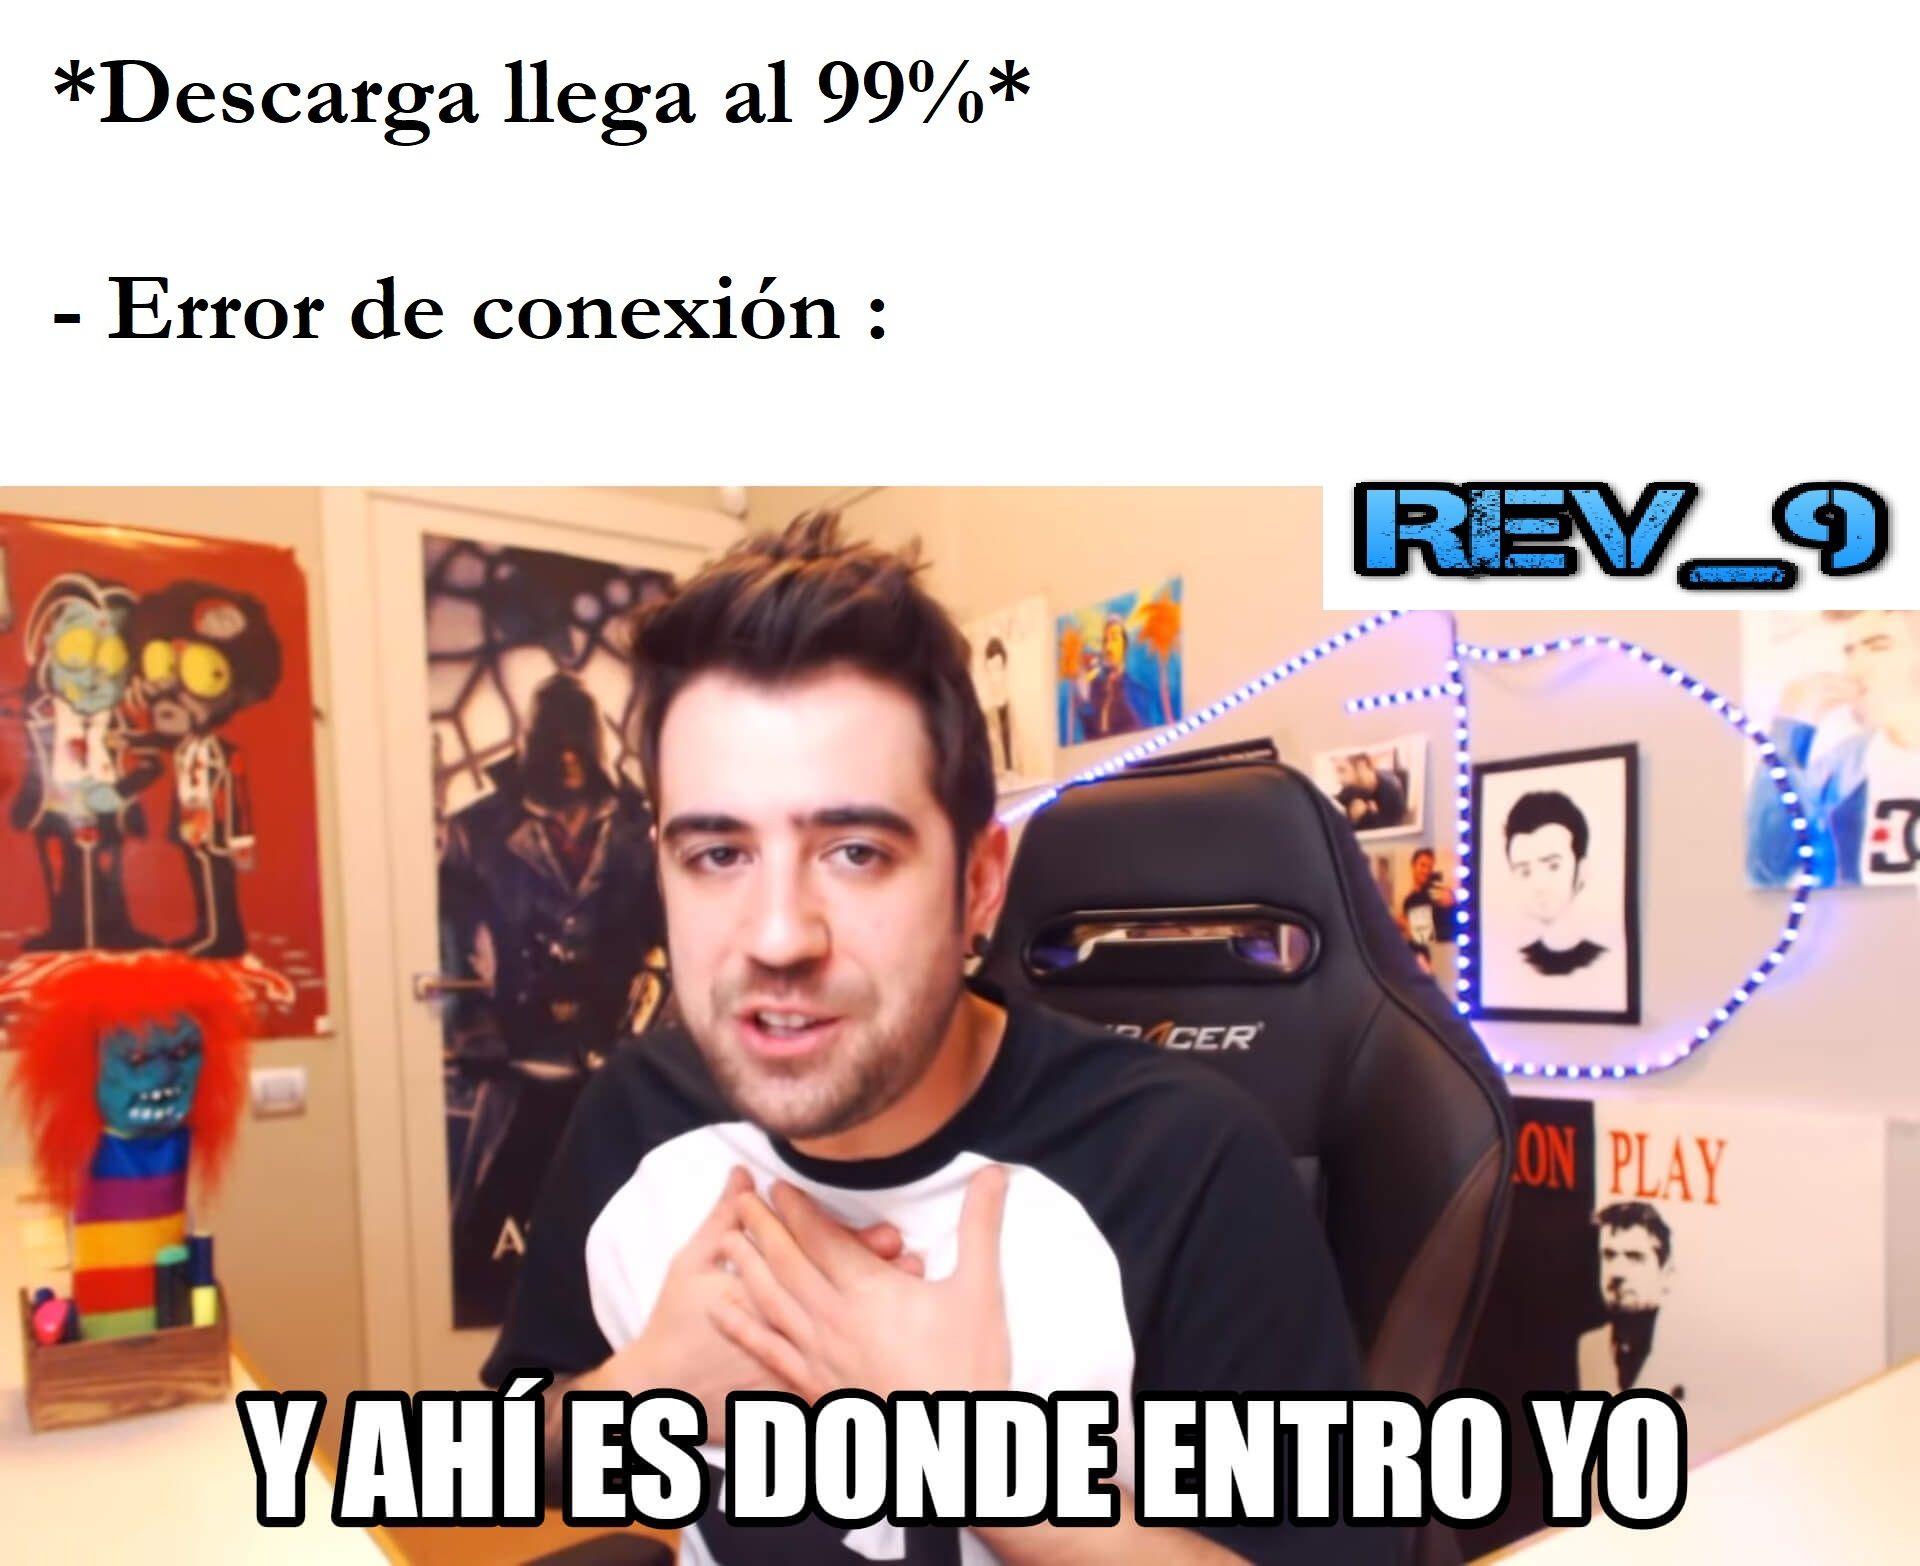 Top Memes De Meme De 2020 En Espanol Memedroid Memes Memes Divertidos Memes Graciosos